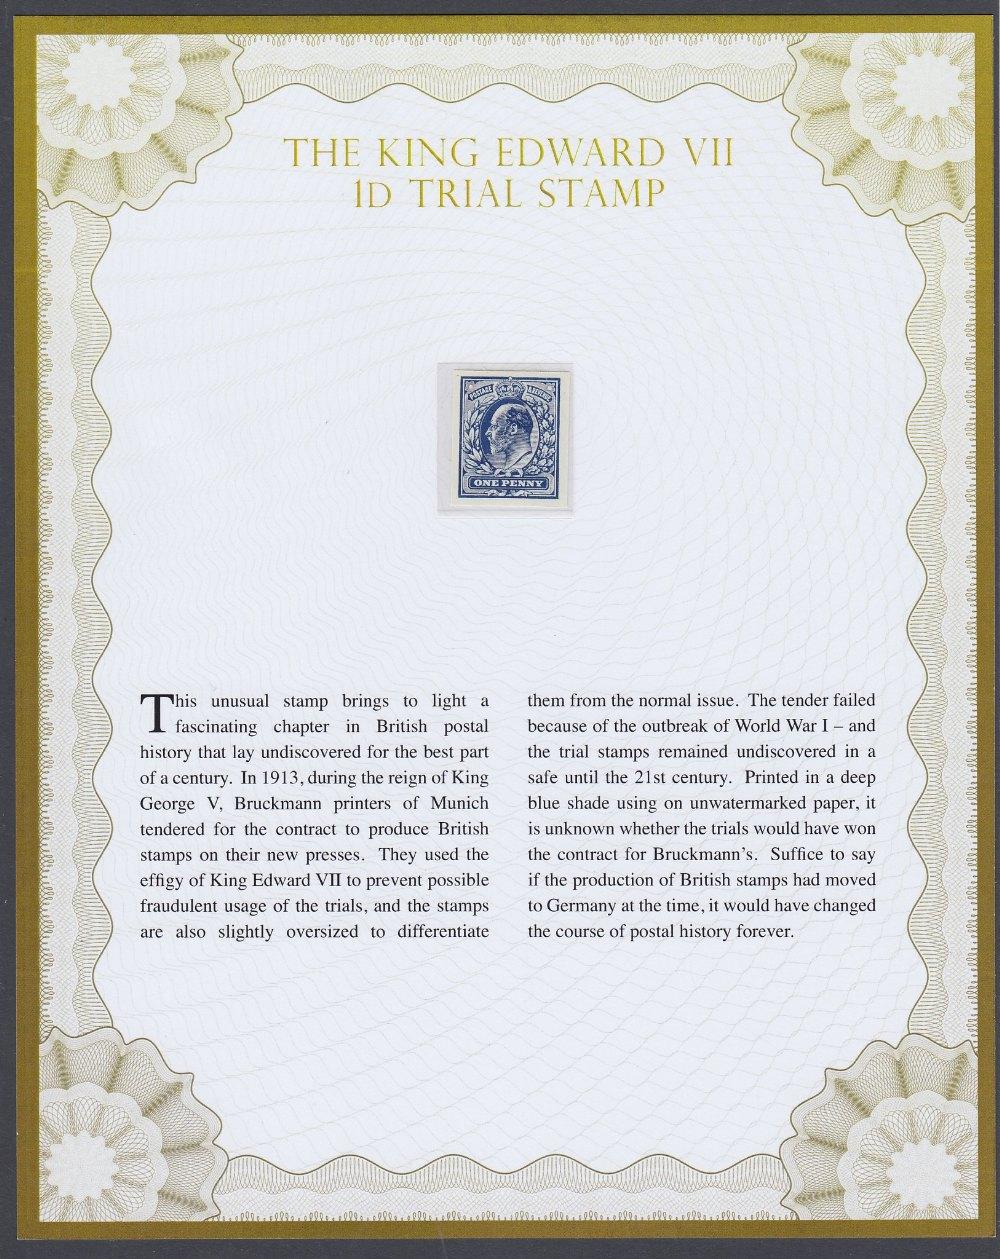 GREAT BRITAIN STAMPS : 1913 1d Blue Imperf colour trial Edward VII design,